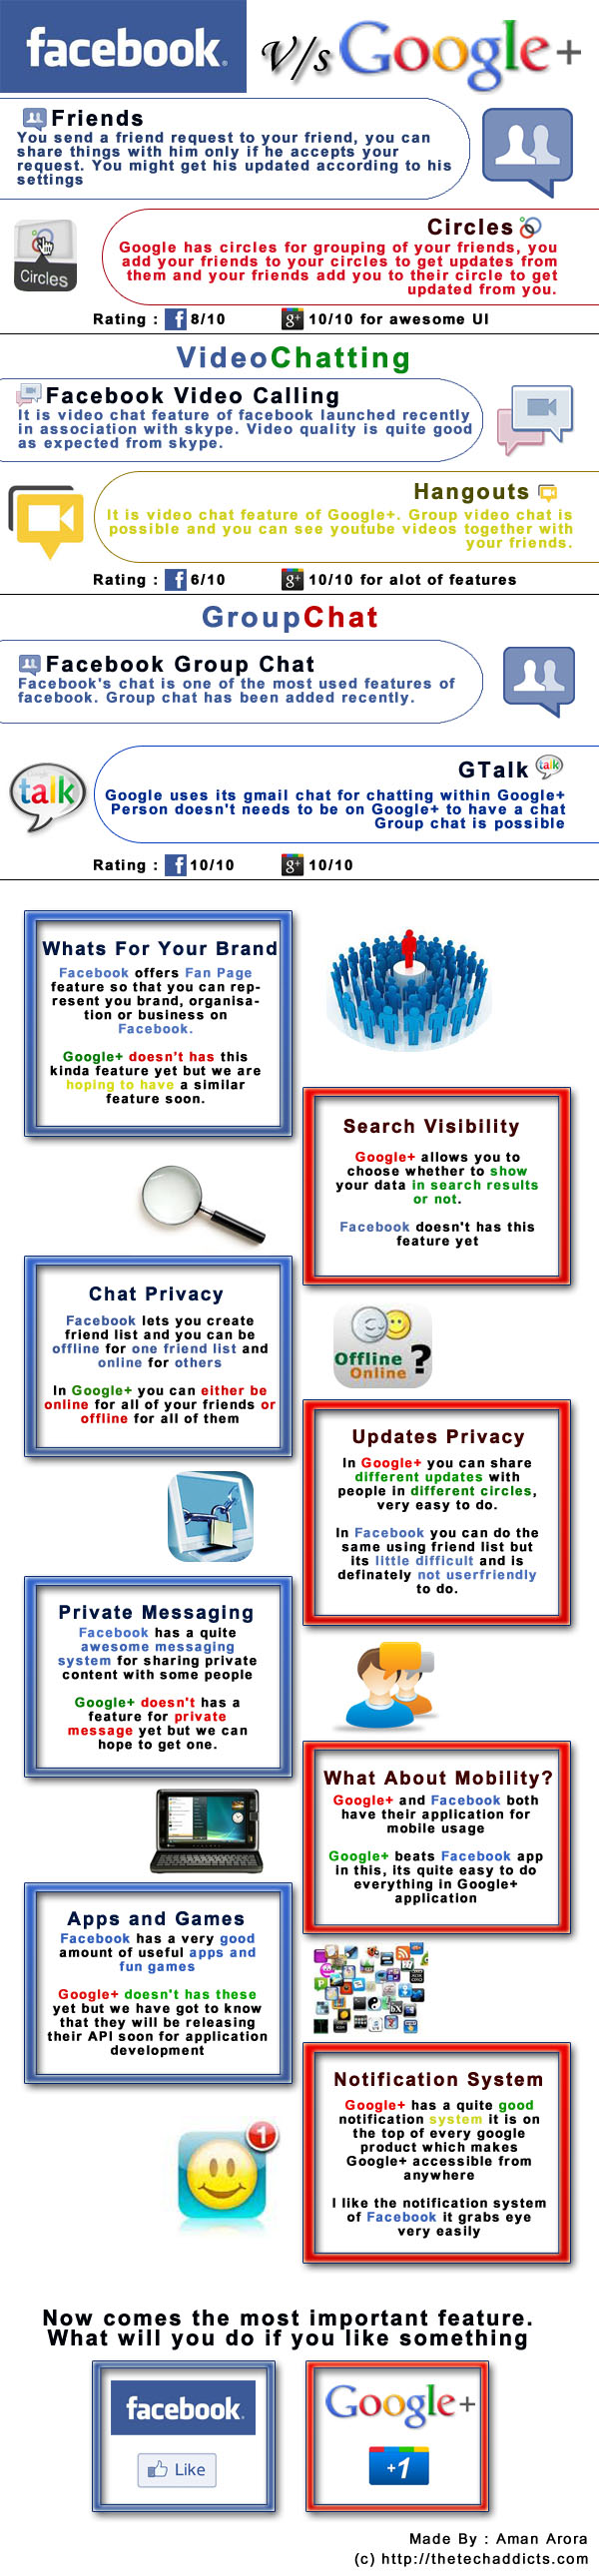 google+vs.facebook